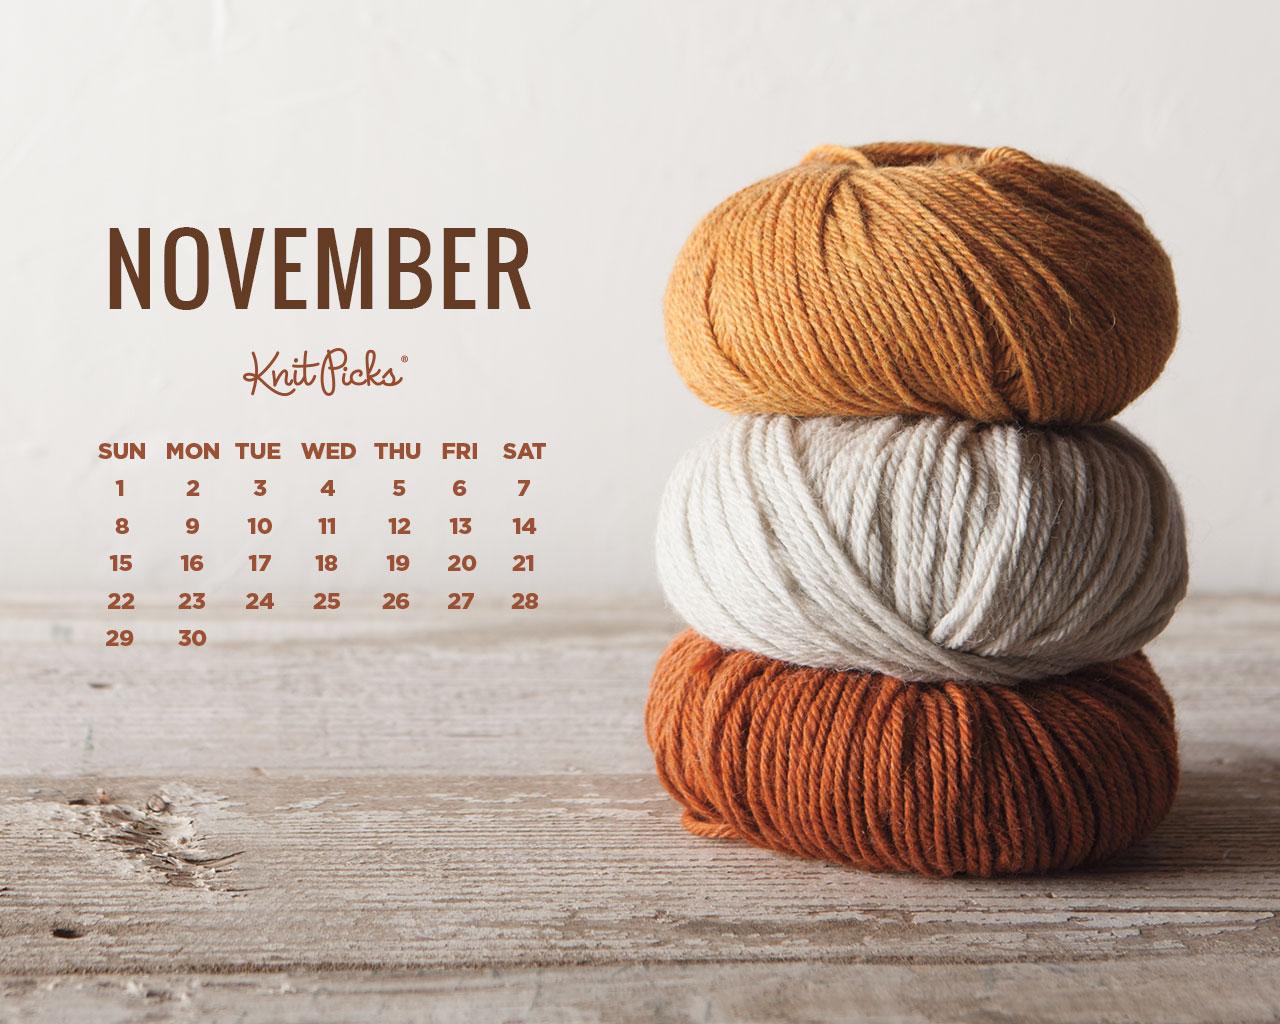 November 2015 Wallpaper Calendar | KnitPicks Staff Knitting Blog